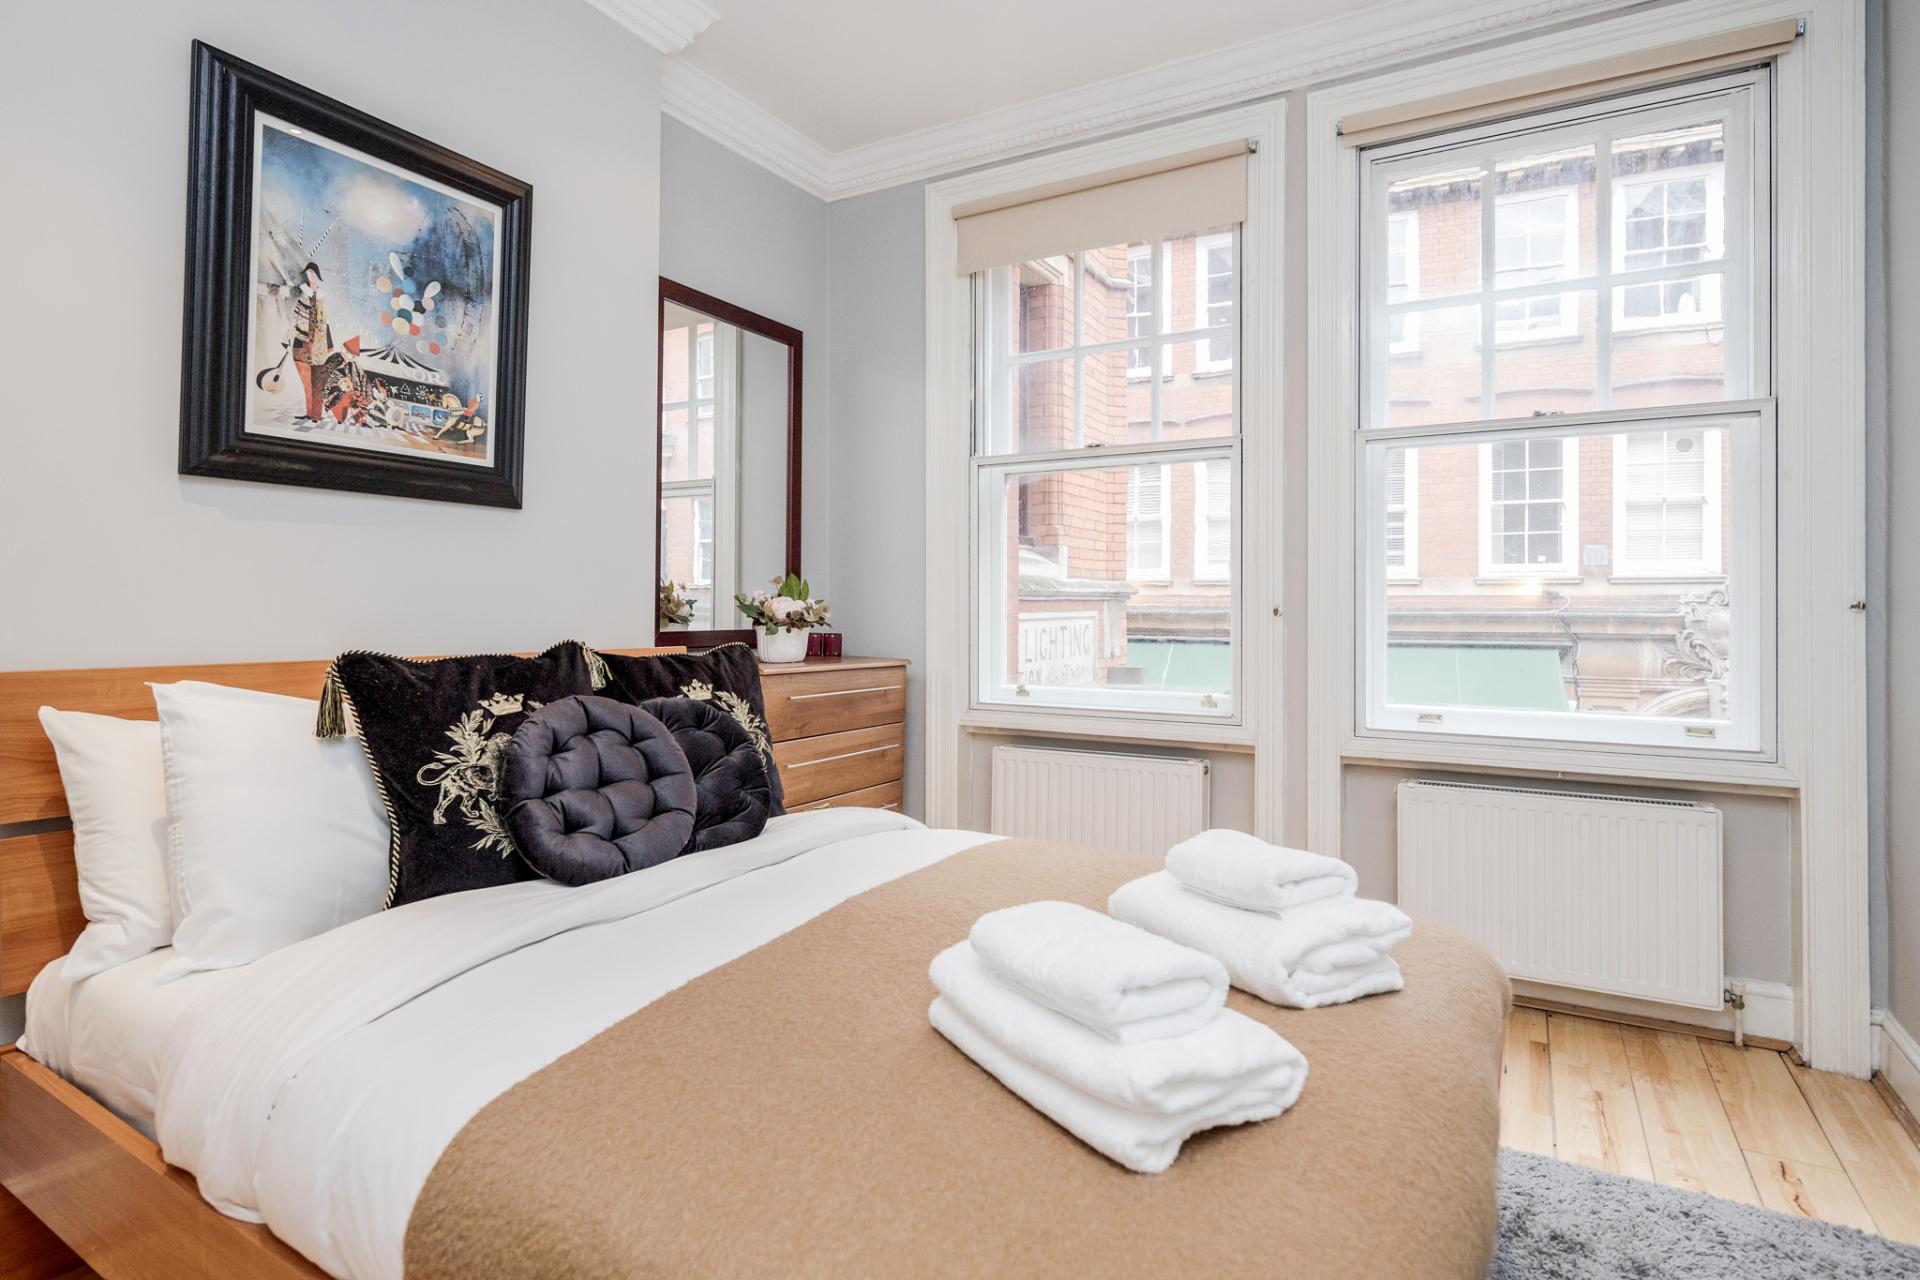 Bedroom at Kensington High Street, Kensington, London - Citybase Apartments